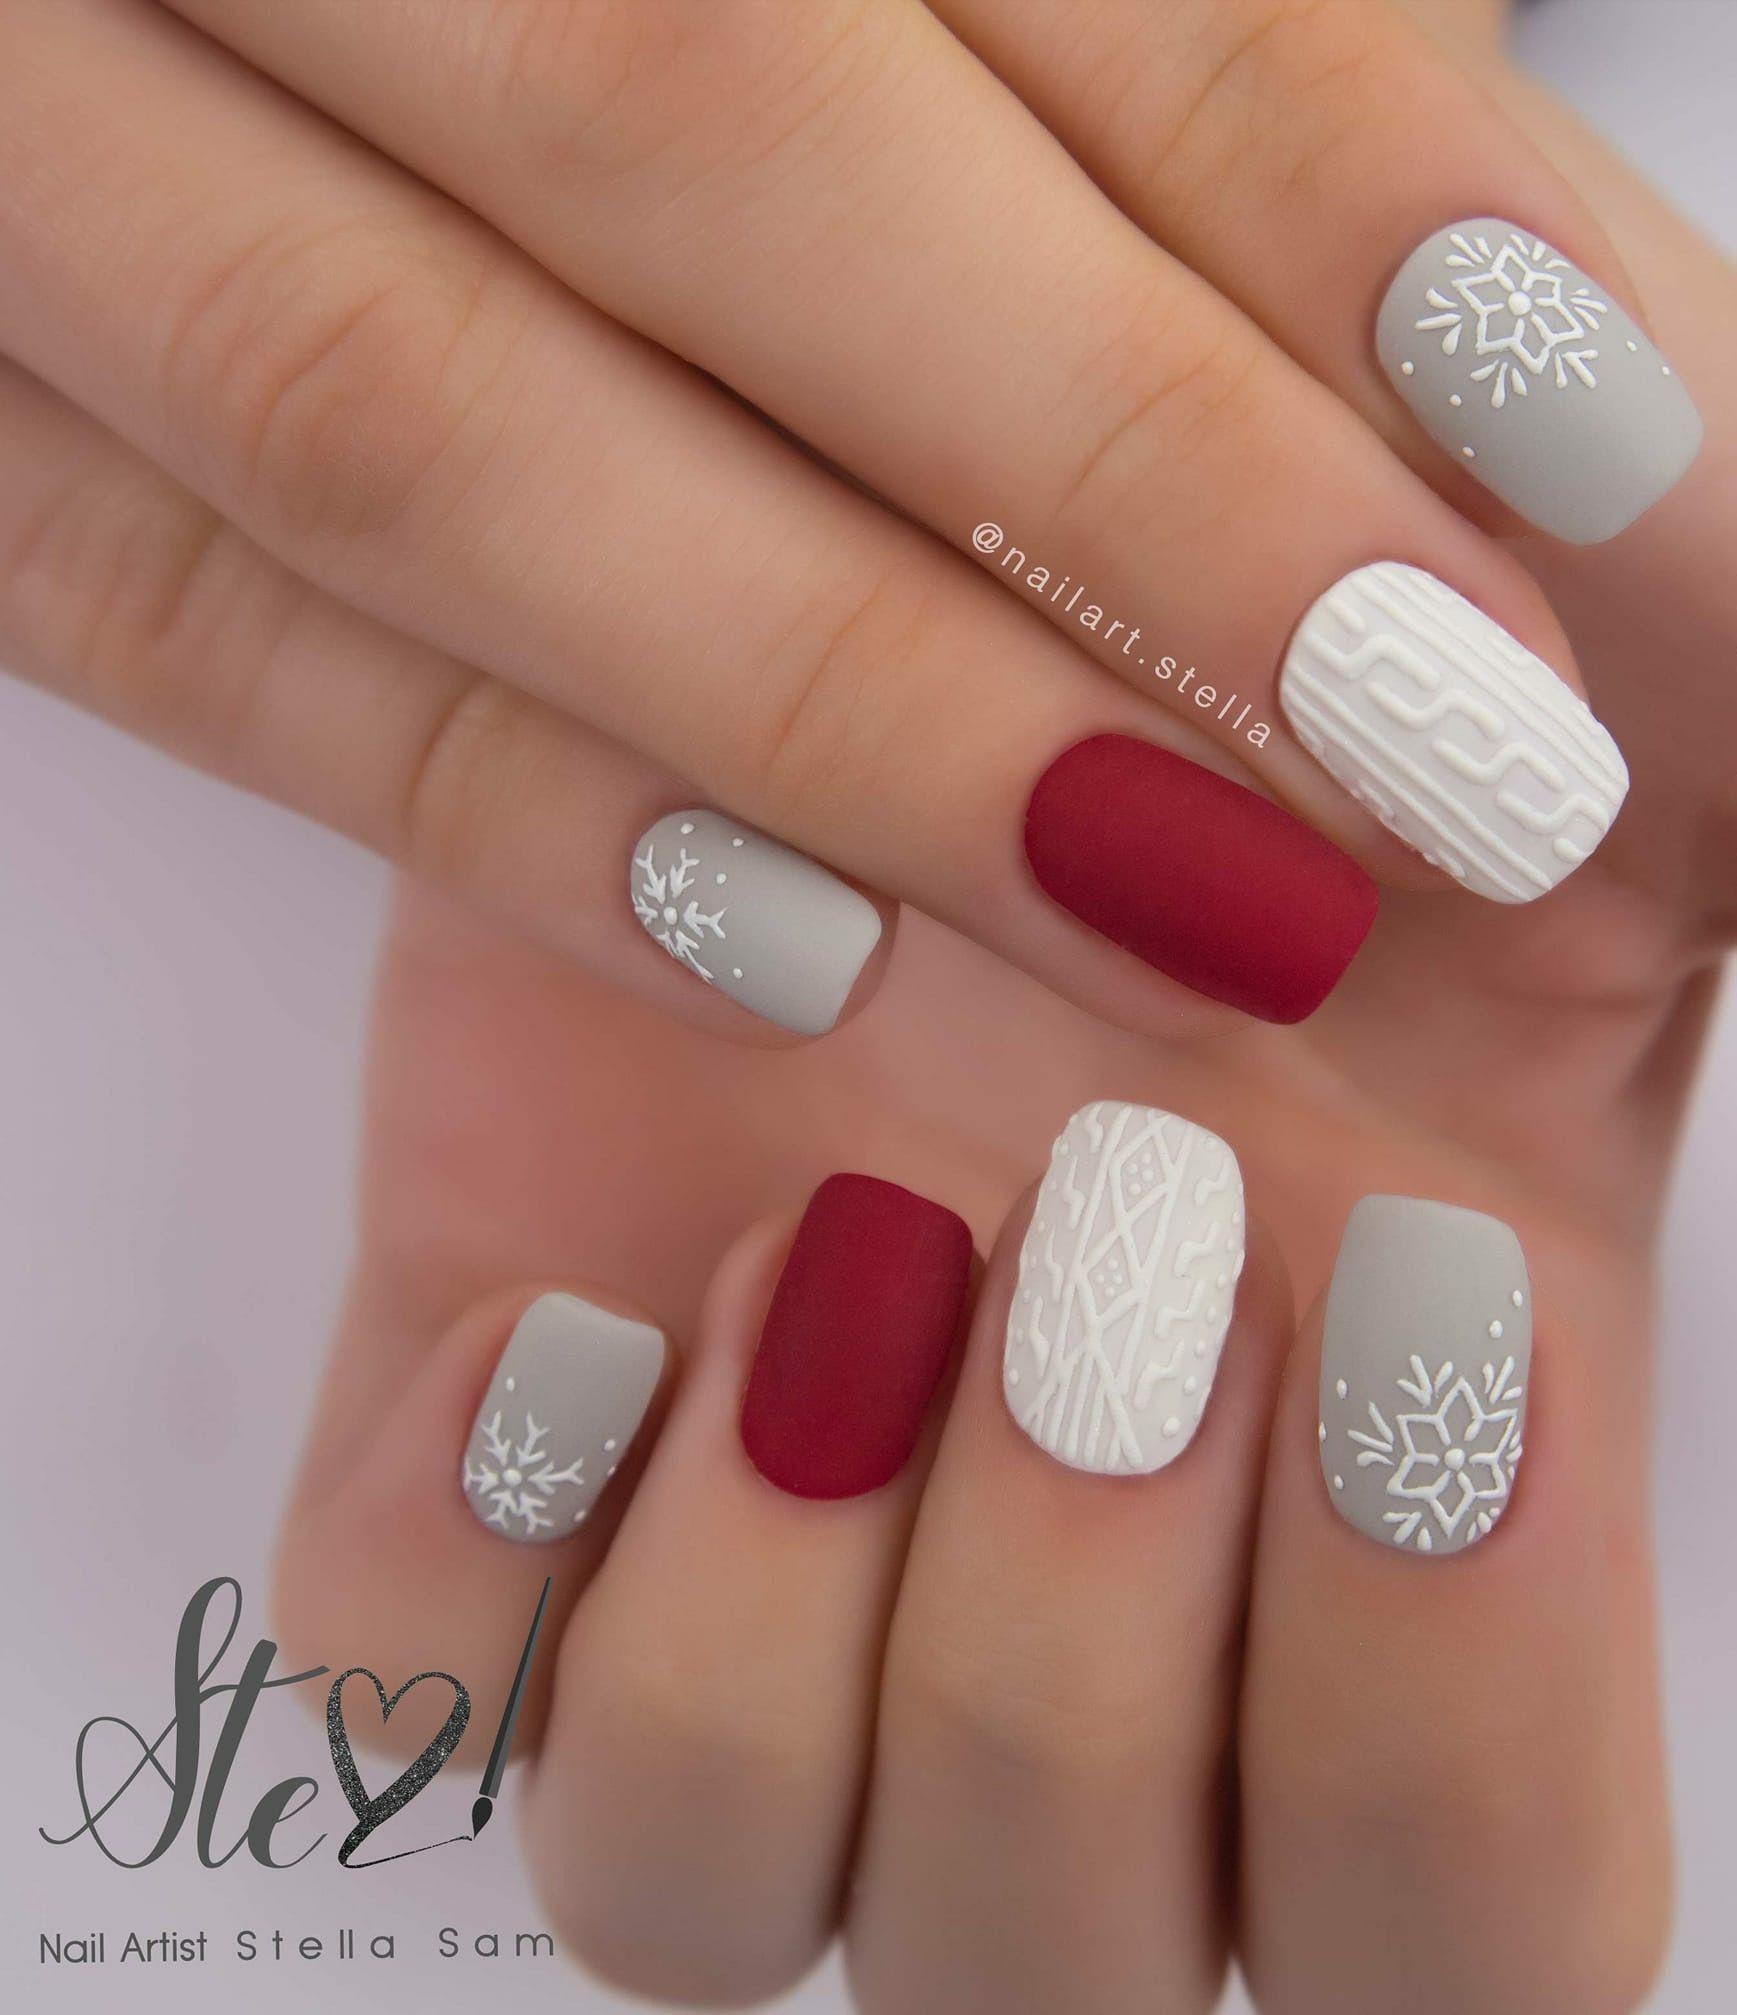 Pin By Tereza Pavlickova On Nails Gelove Nehty Pastelove Nehty Design Nehtu